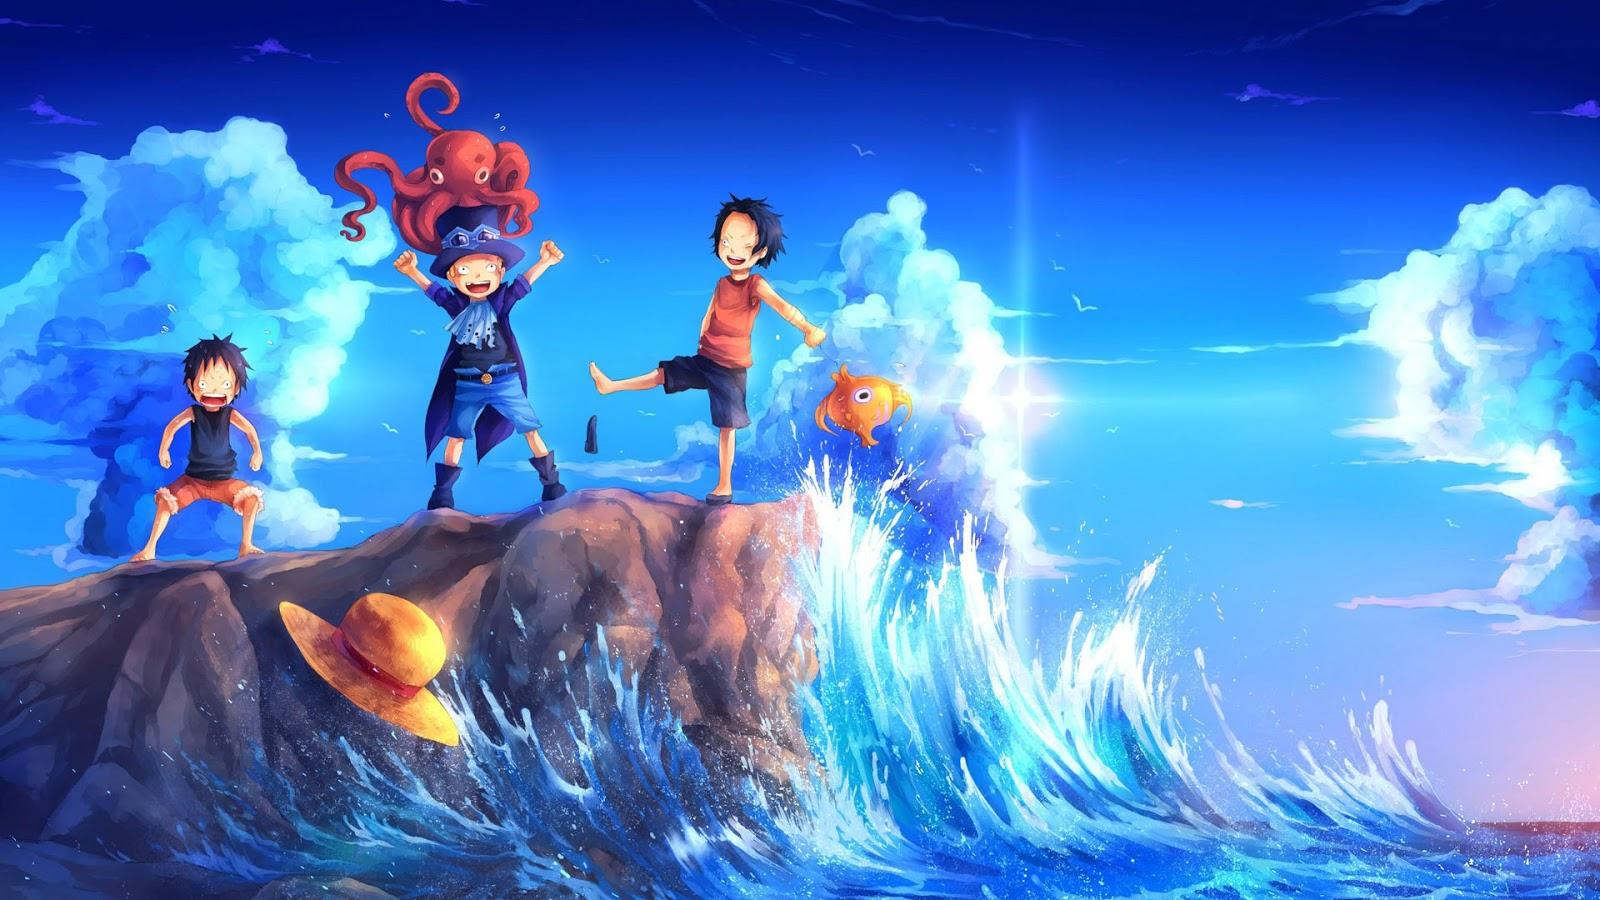 Gambar Wallpaper One Piece HD Terbaru 2016 Blogyoikocom